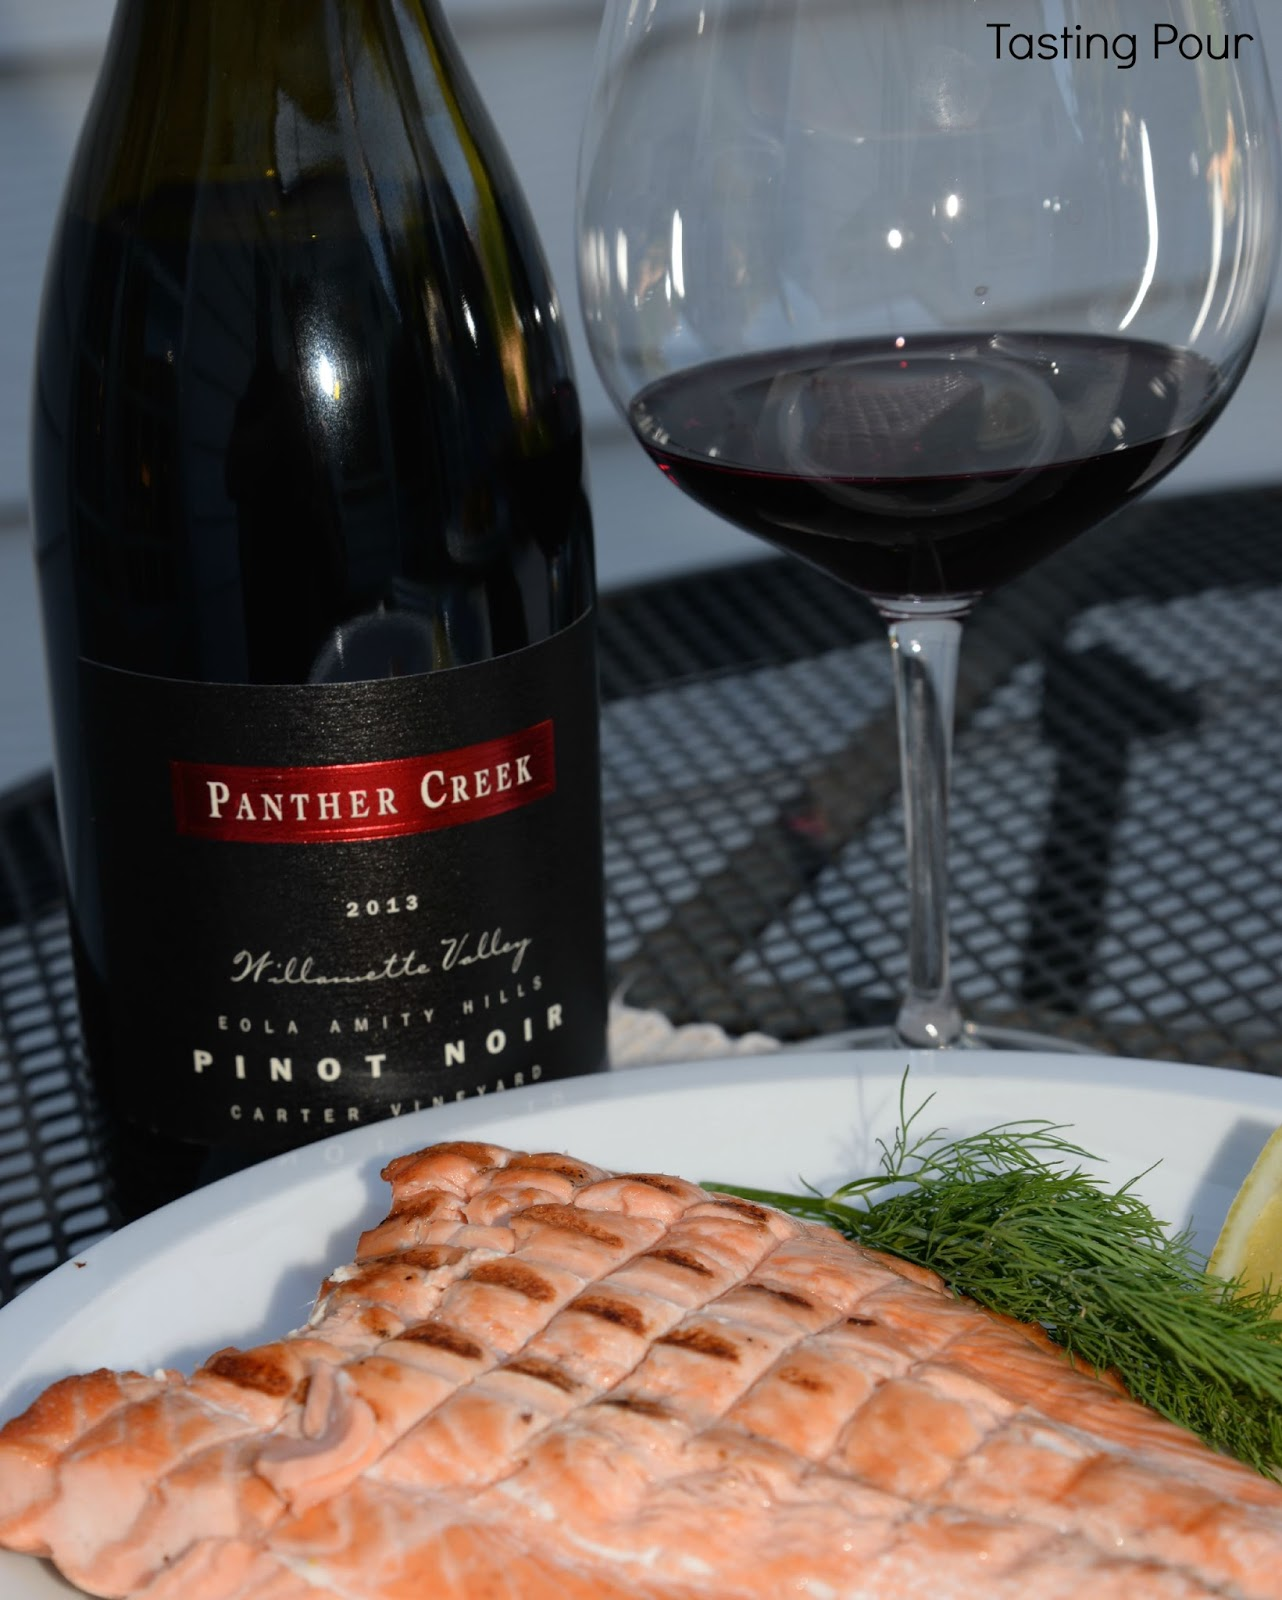 Panther Creek Cellars Carter Vineyard Pinot Noir and Salmon & Panther Creek Cellars Pinot Noir Pairings - Tasting Pour by Jade Helm